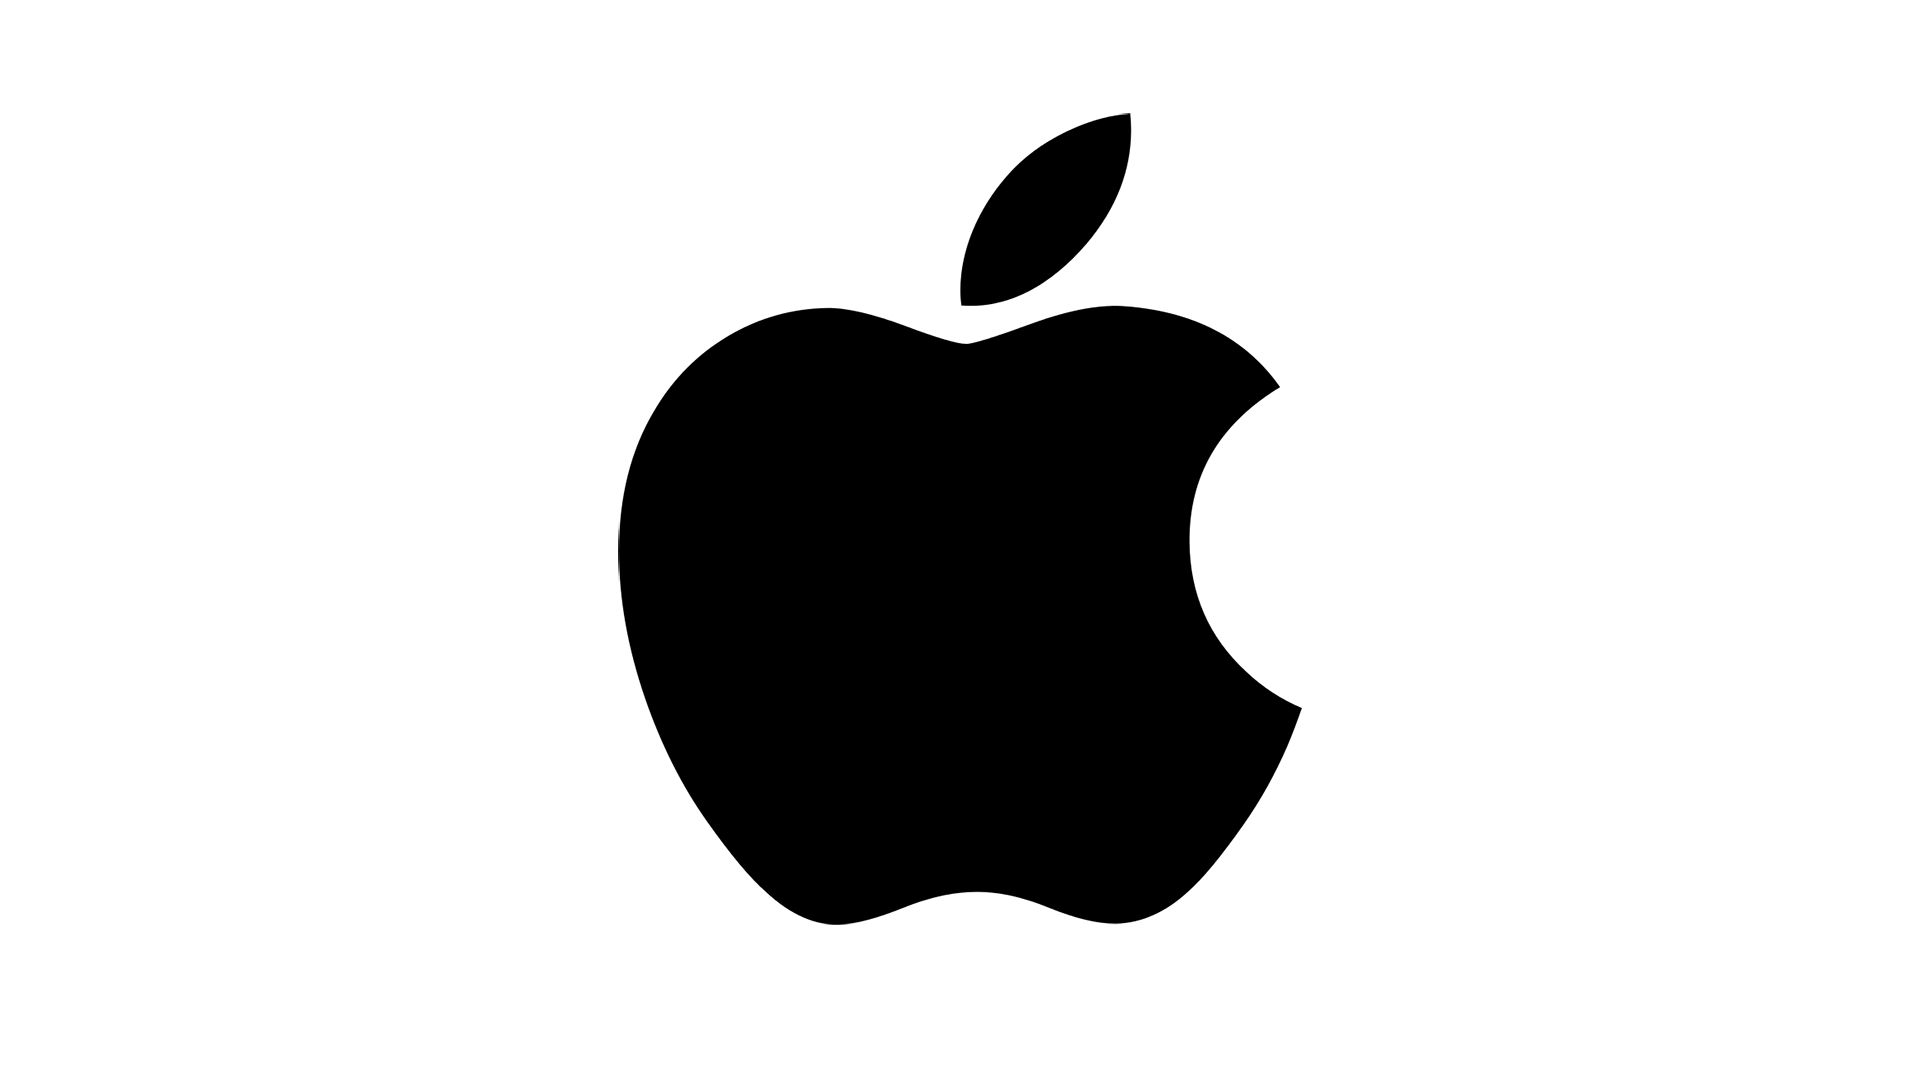 Apple Inc. clipart apple logo #9